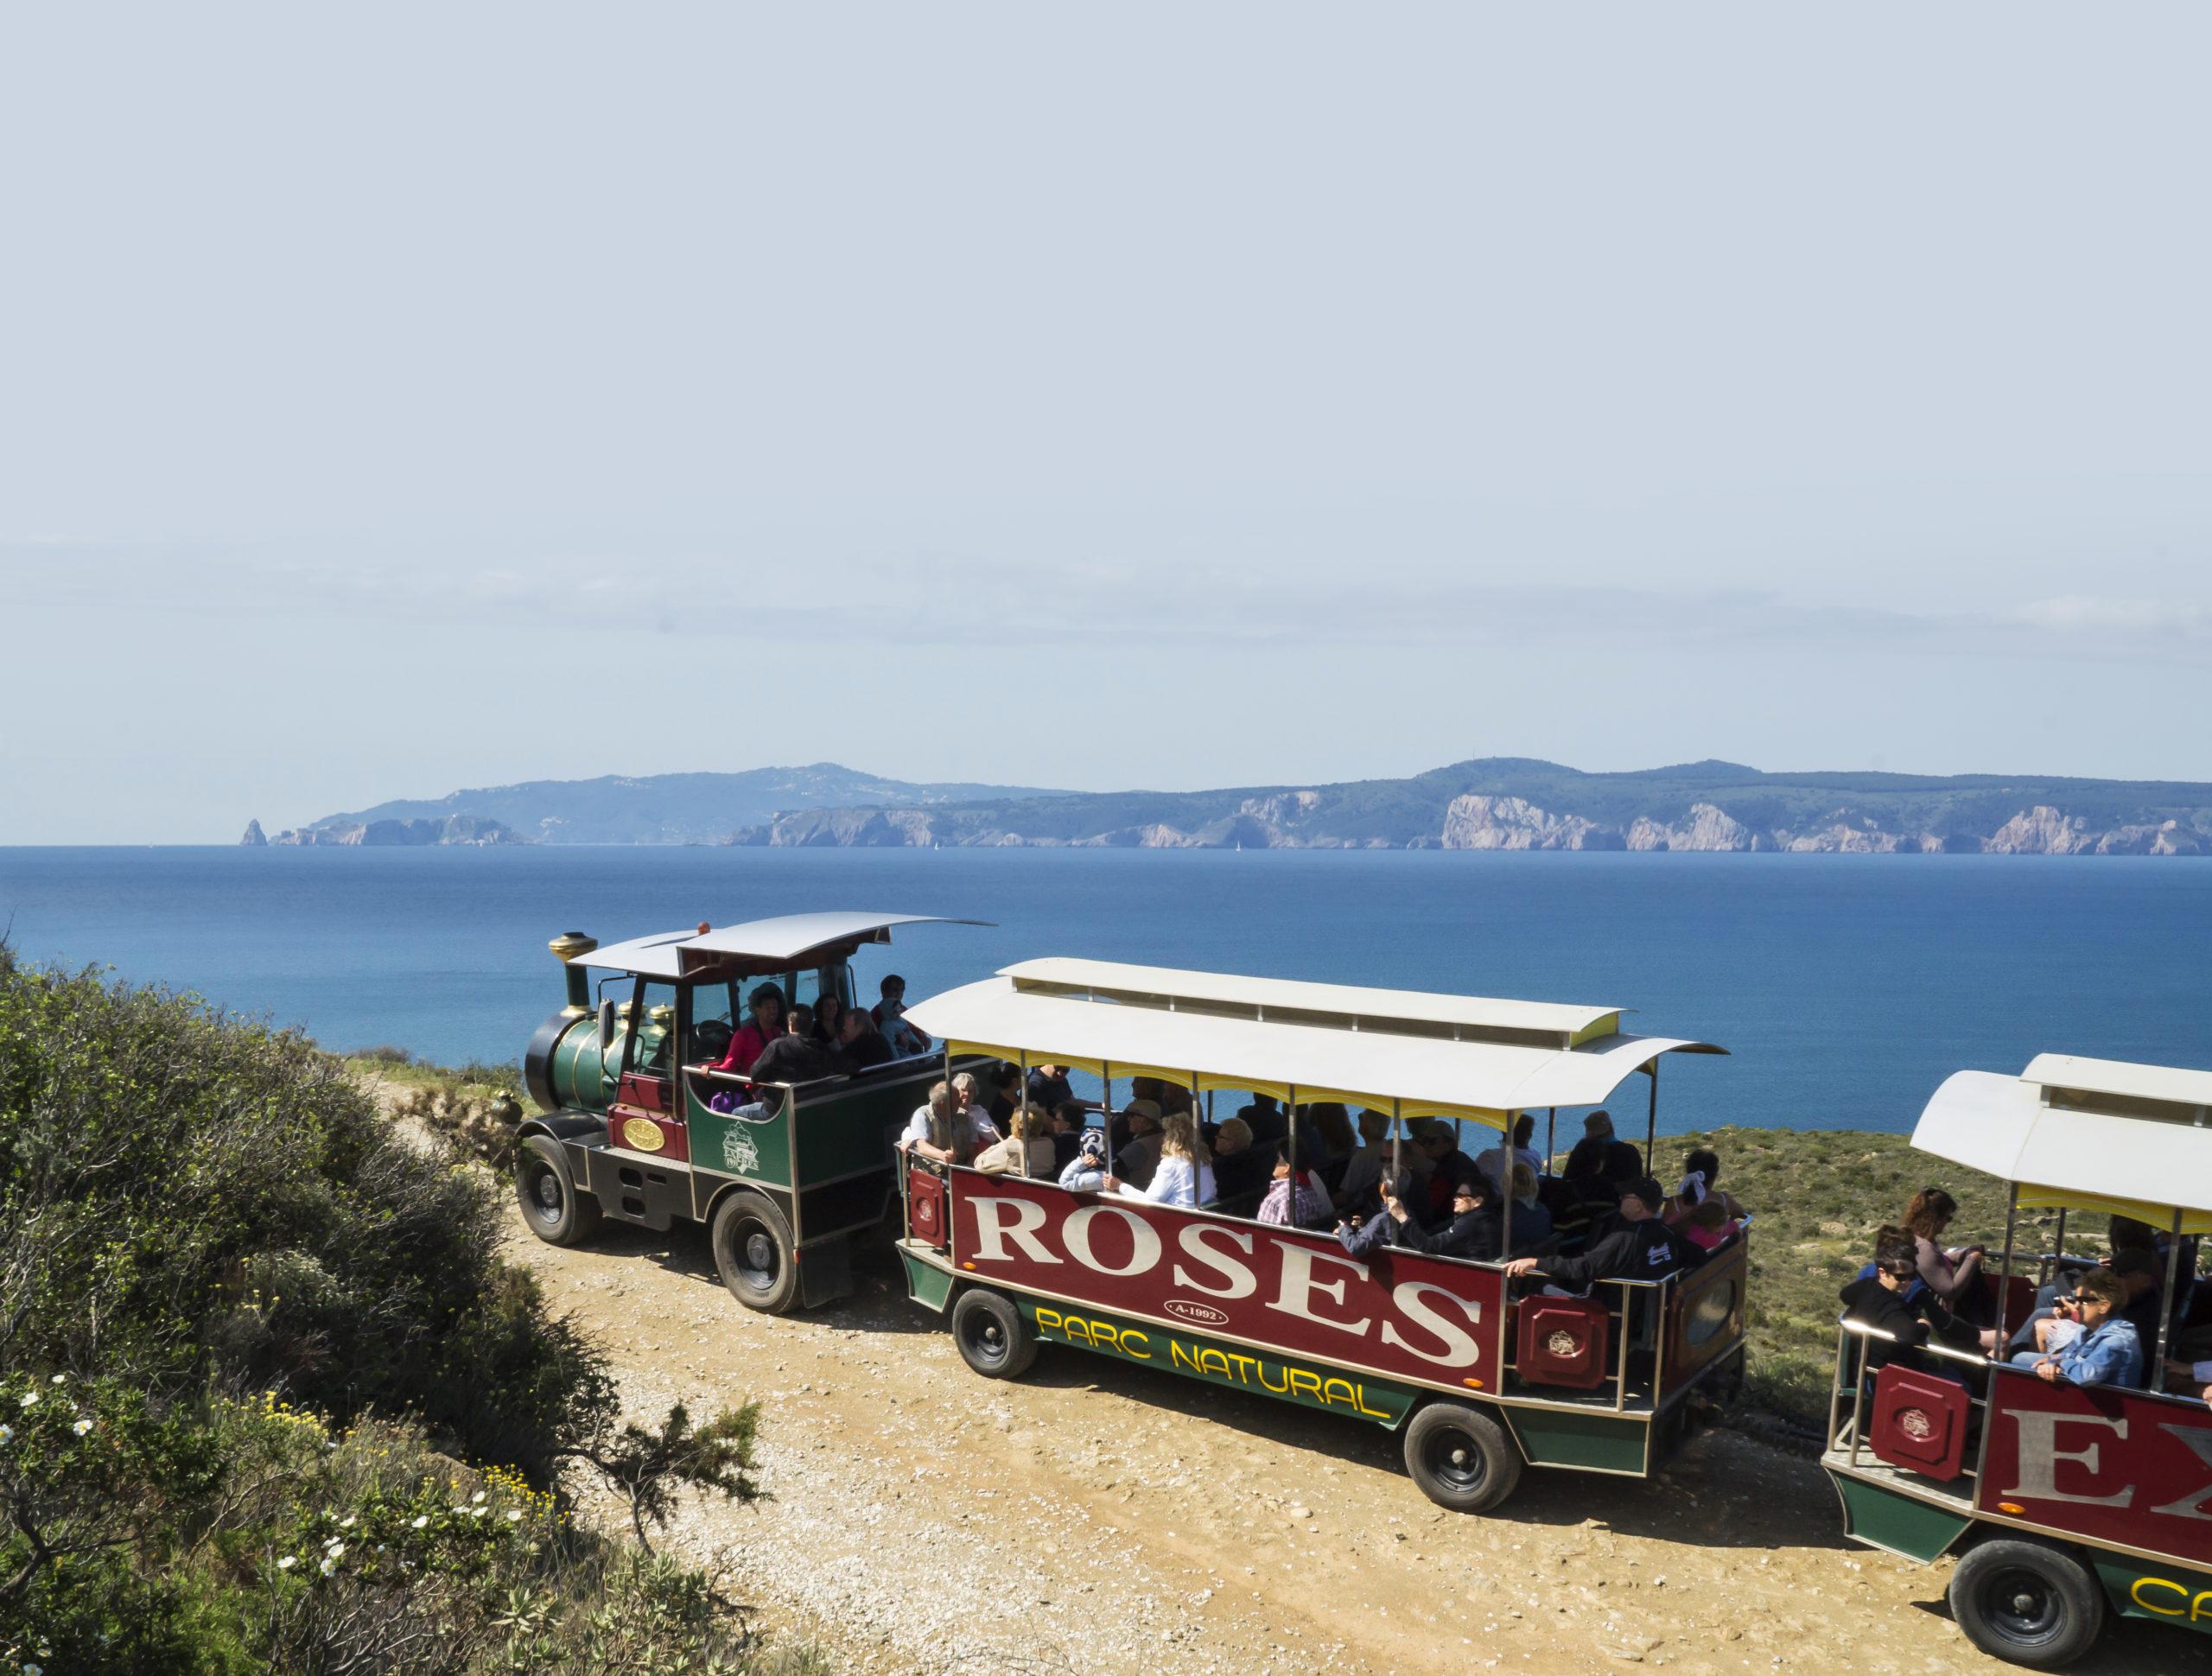 Tren Turístic Roses Expres